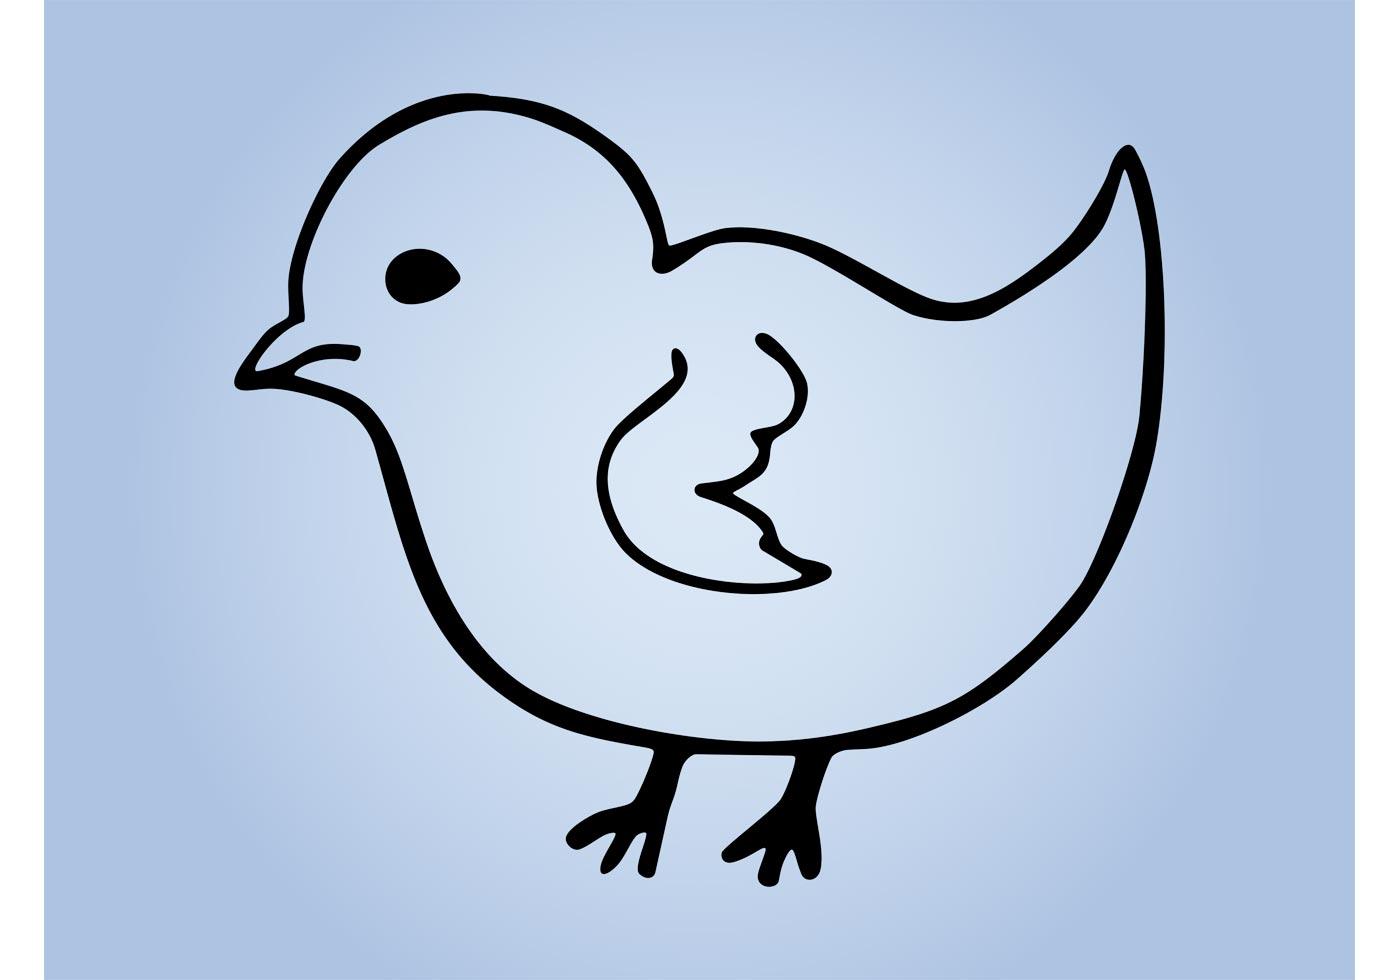 Bird Outline Free Vector Art 6107 Free Downloads